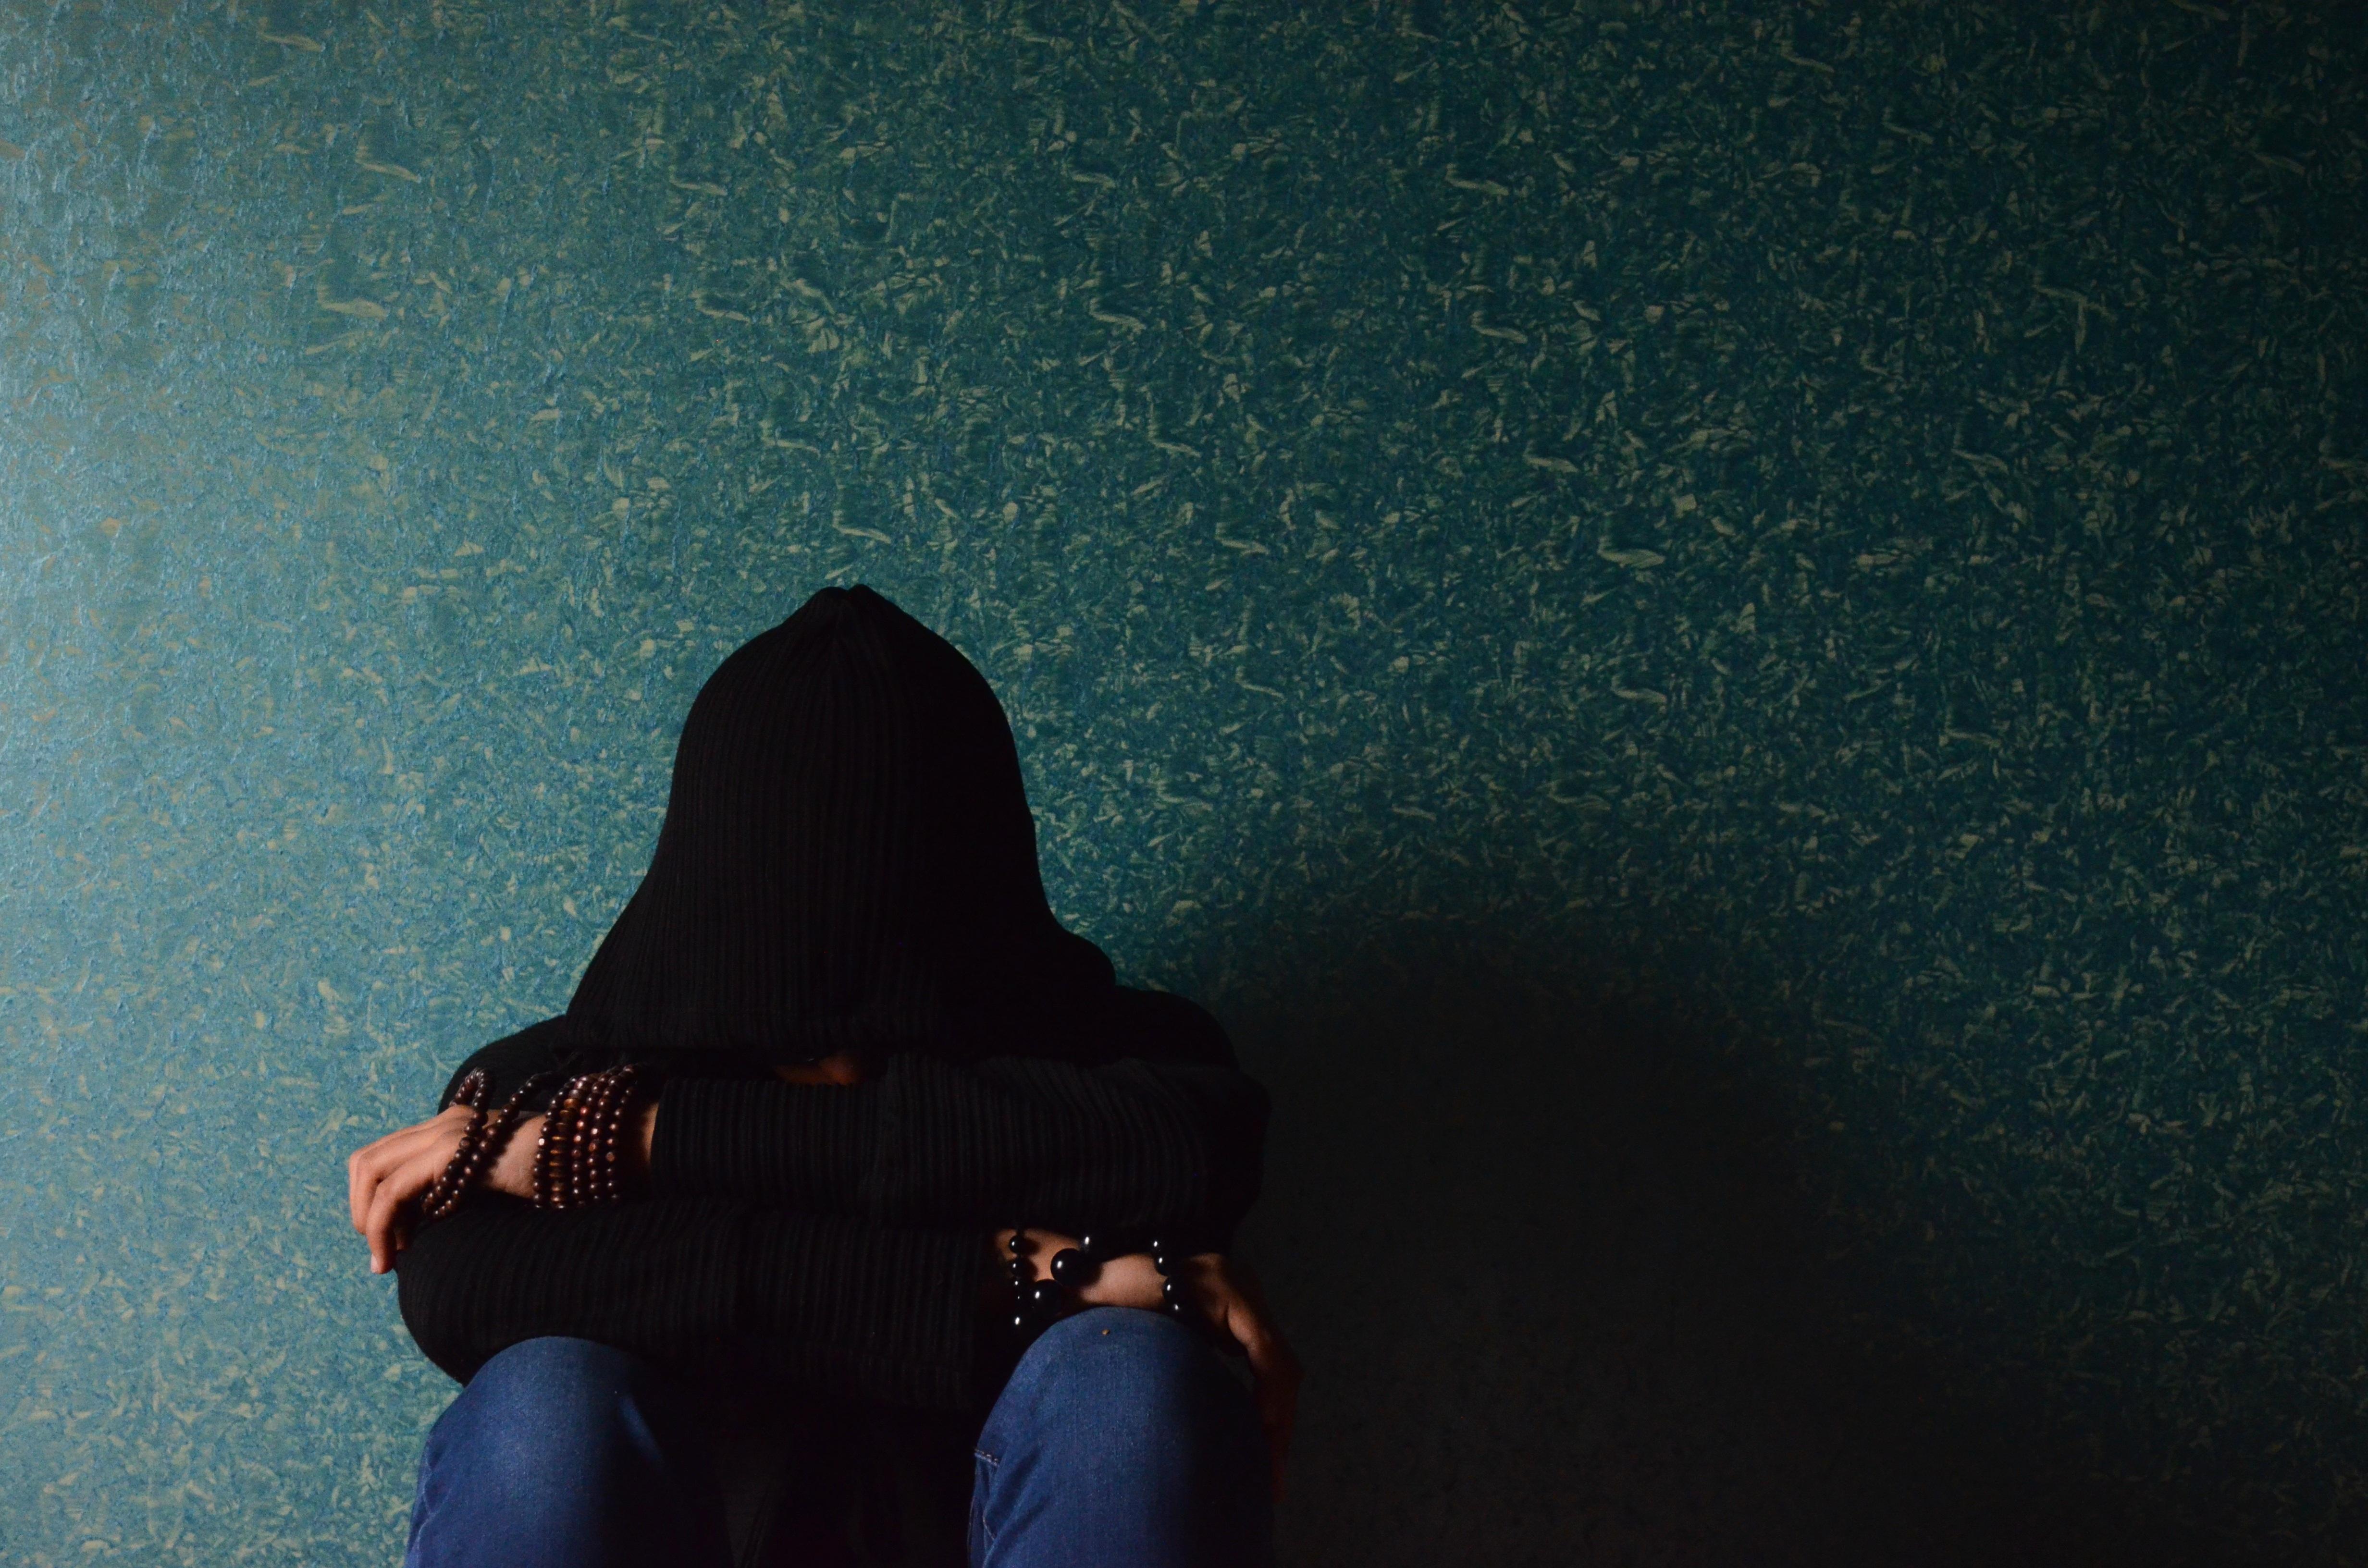 Gambar Tangan Manusia Bayangan Hitam Orang Cahaya Malam Pria Refleksi Warna Duduk Kegelapan Biru Tudung Sedih Emosional Kesedihan Menekankan Kesulitan Dewasa Depresi Tidak Bahagia Murung Cemas 4928x3264 952504 Galeri Foto